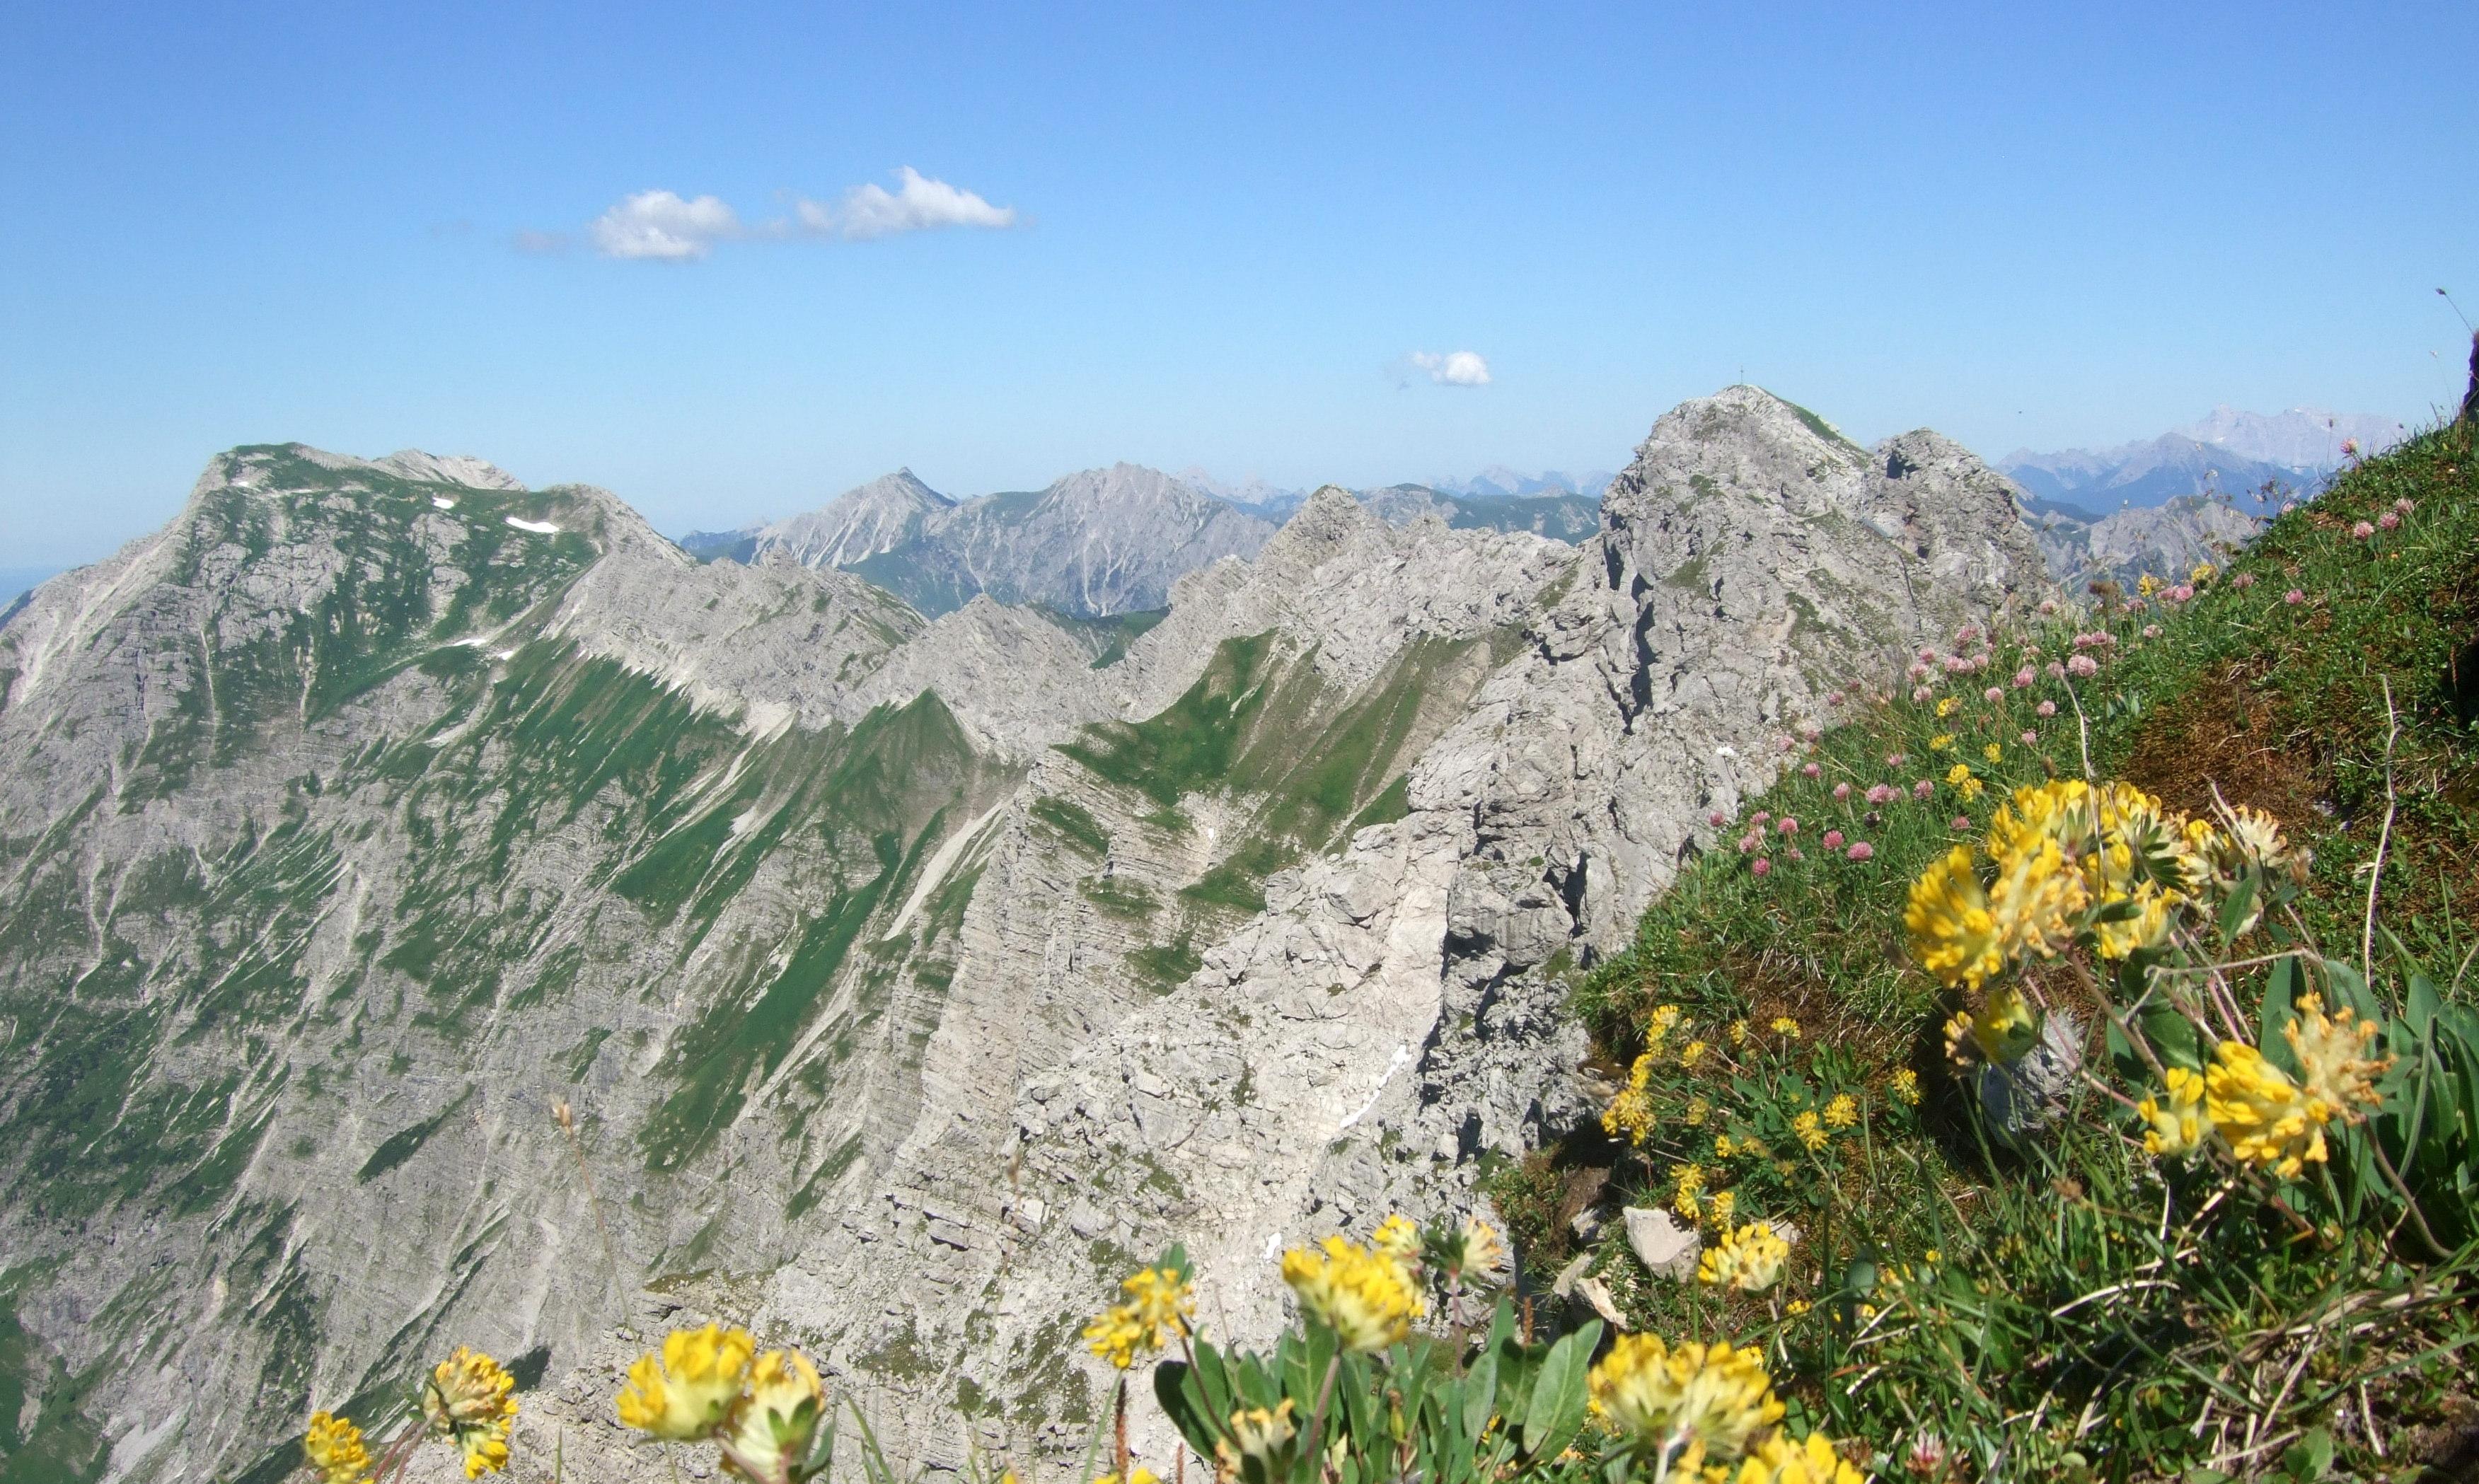 Klettersteig Nebelhorn : Nebelhorn klettersteig und panoramawege durchs hochallgäu